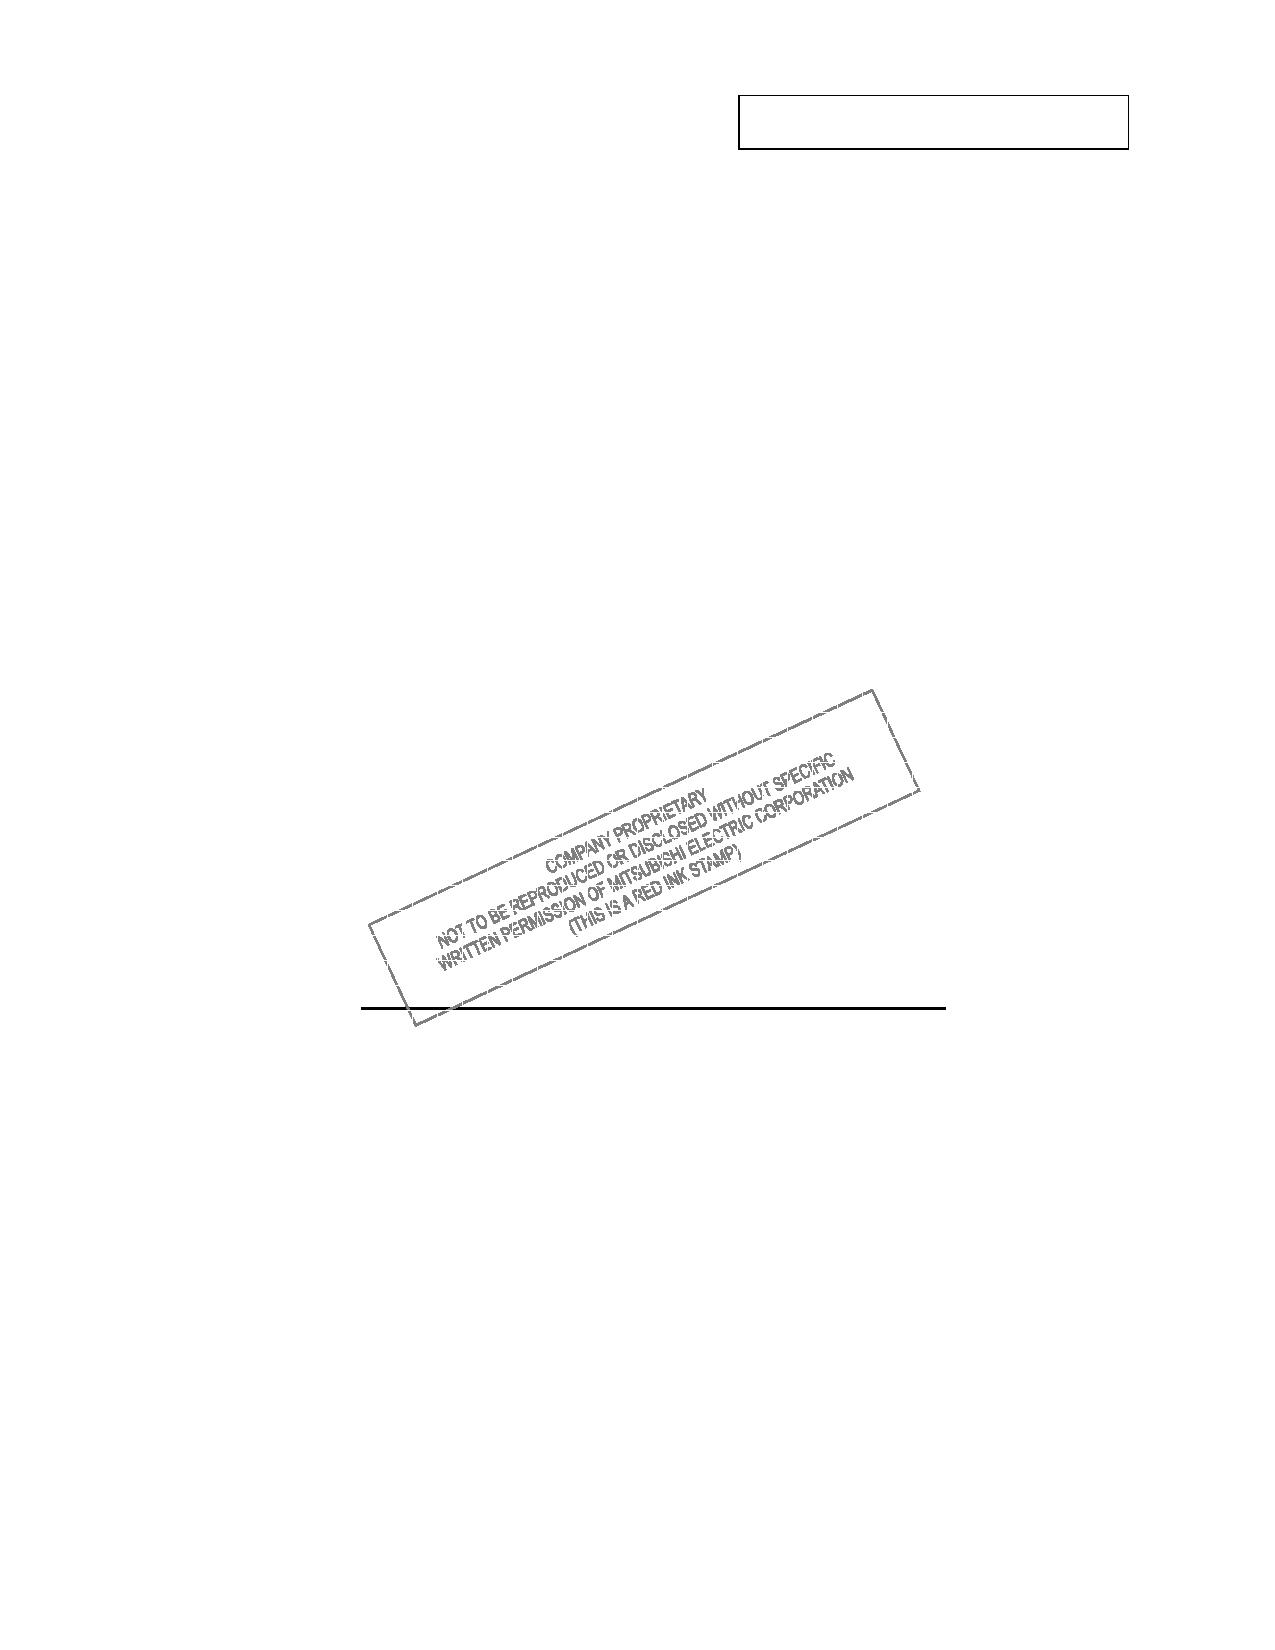 T-55226D043J-LW-A-AAN دیتاشیت PDF